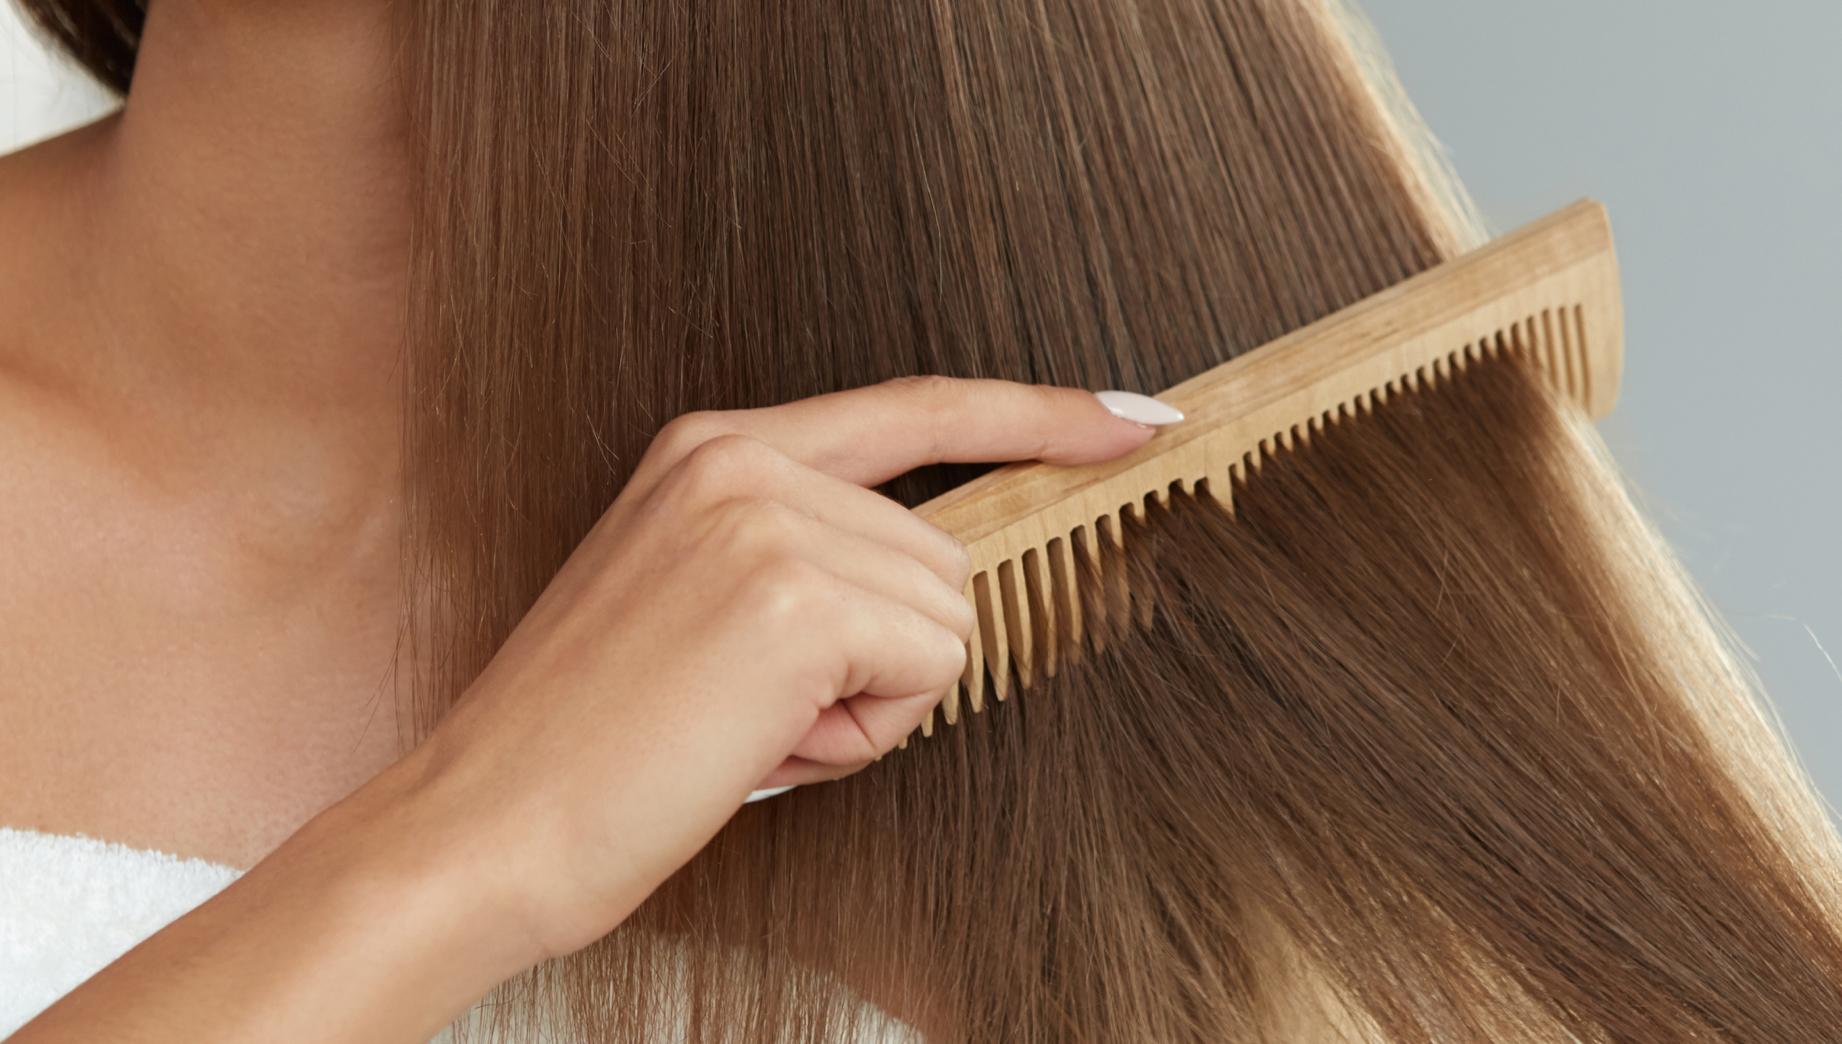 Dry Haircut/trim